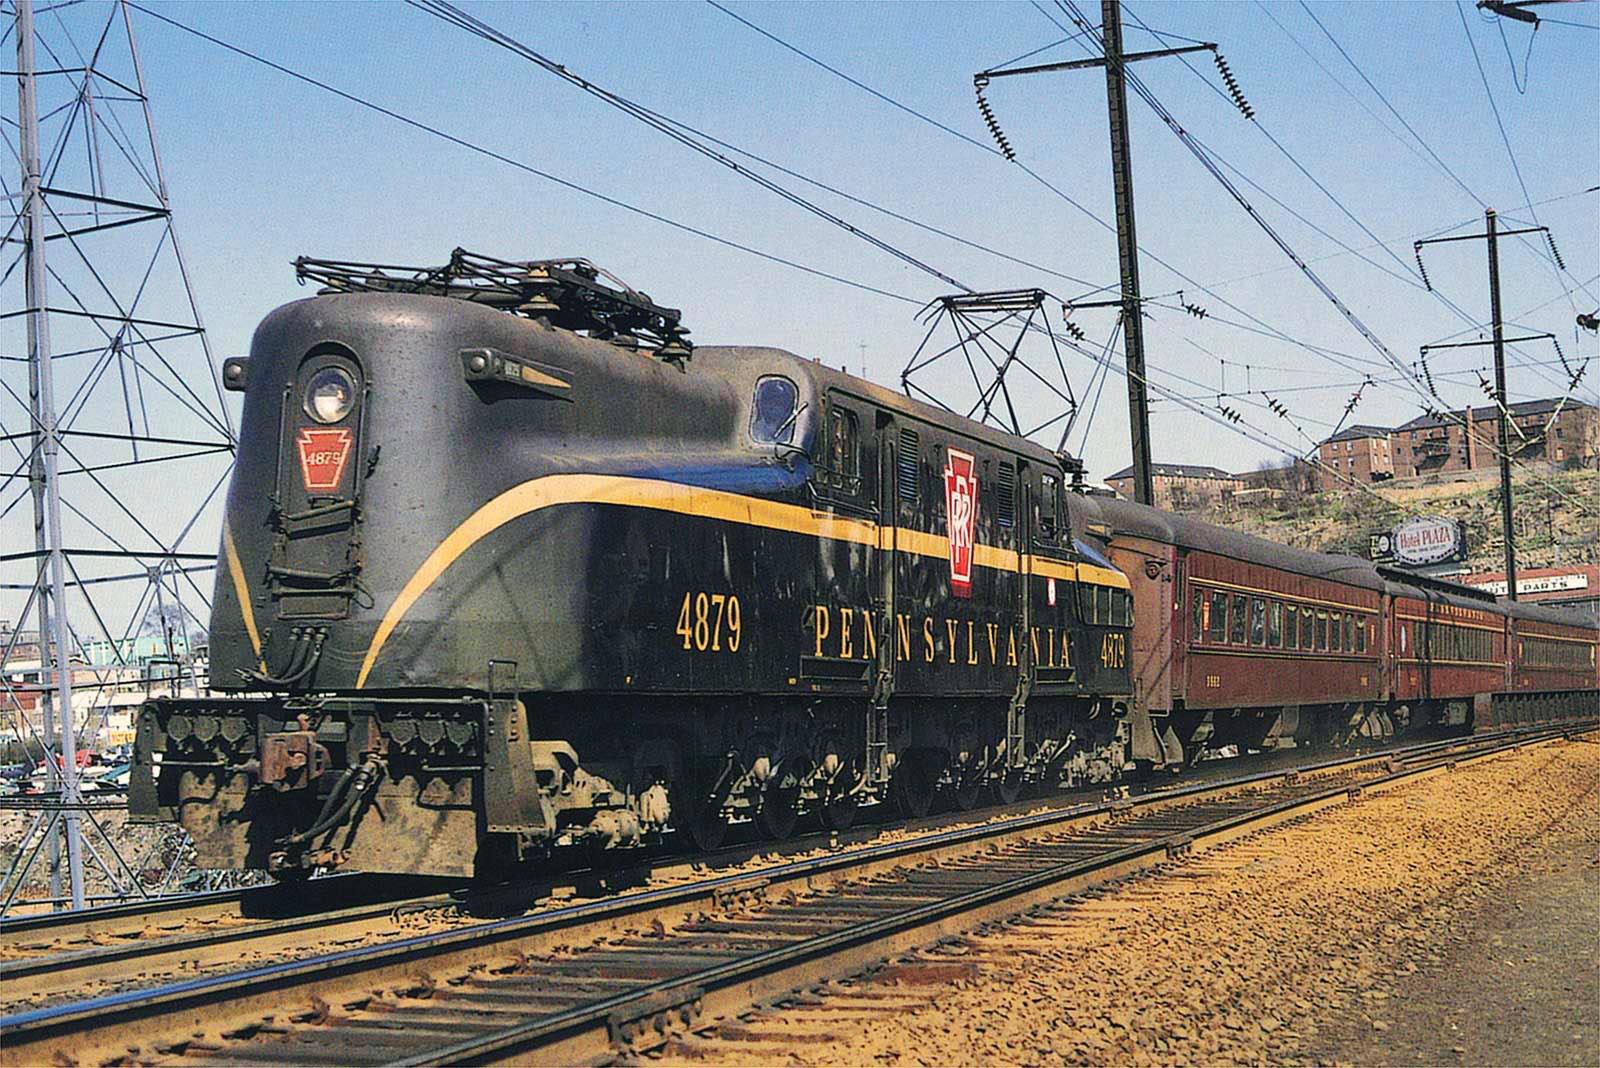 Pennsylvania Railroad, The PRR